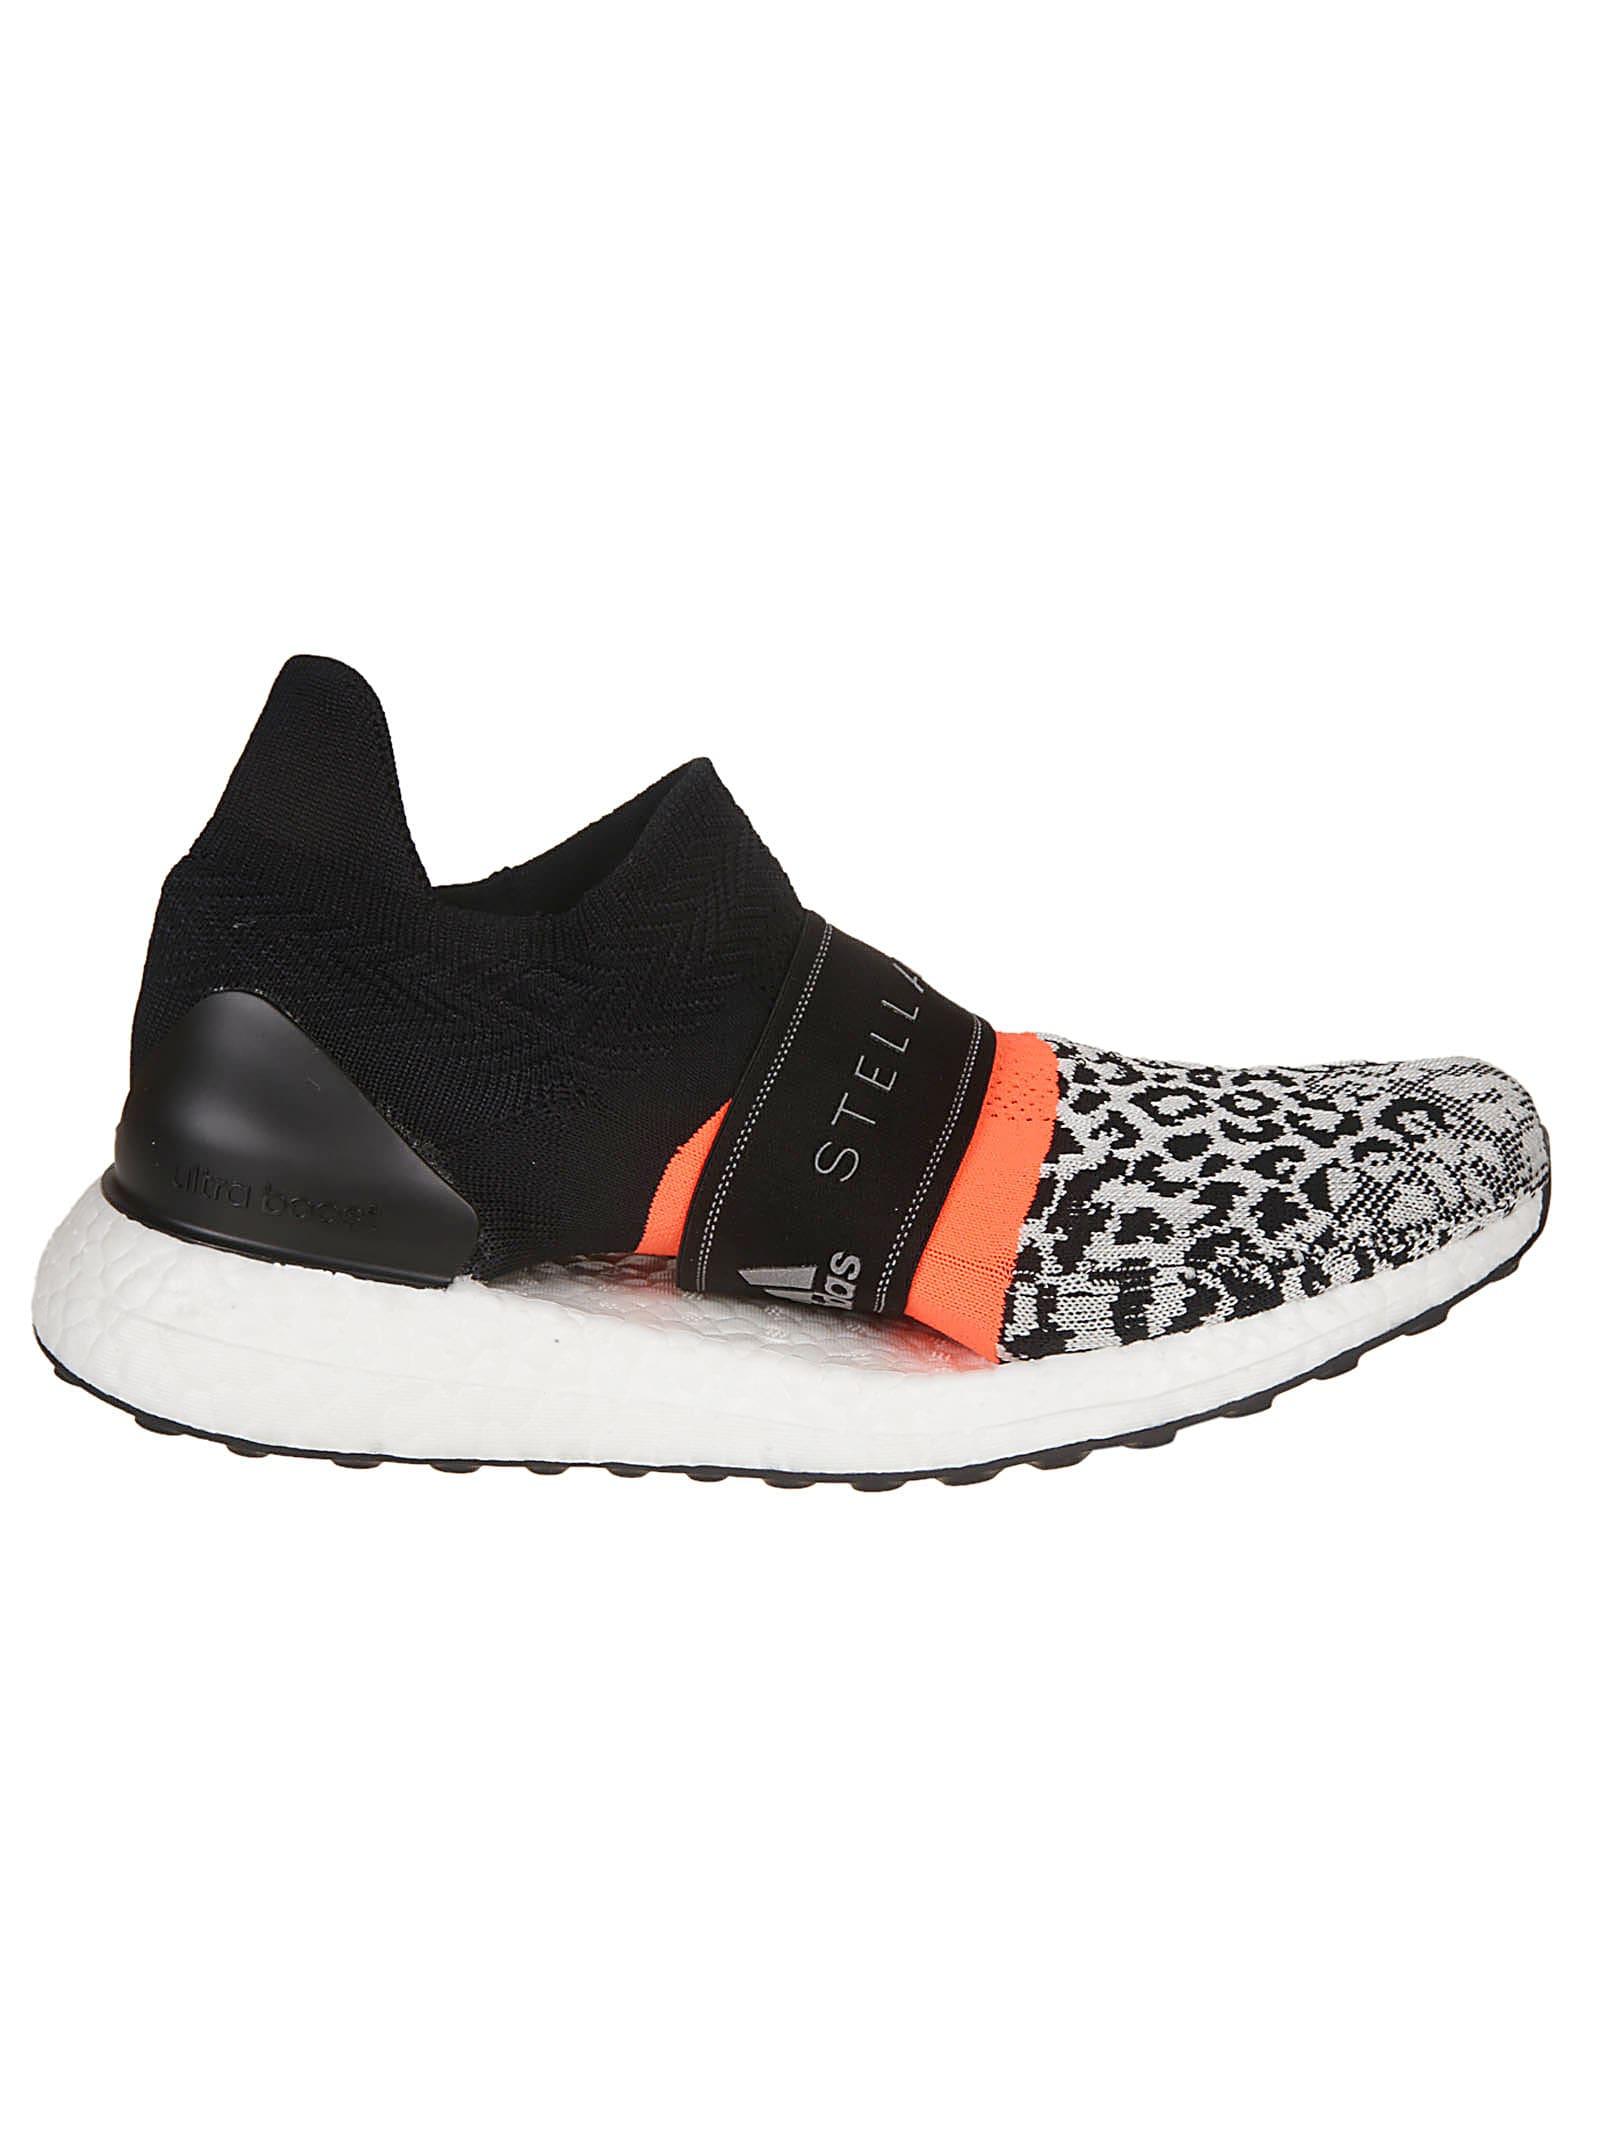 sold worldwide size 40 sale usa online Adidas by Stella McCartney Animal Print Sneakers